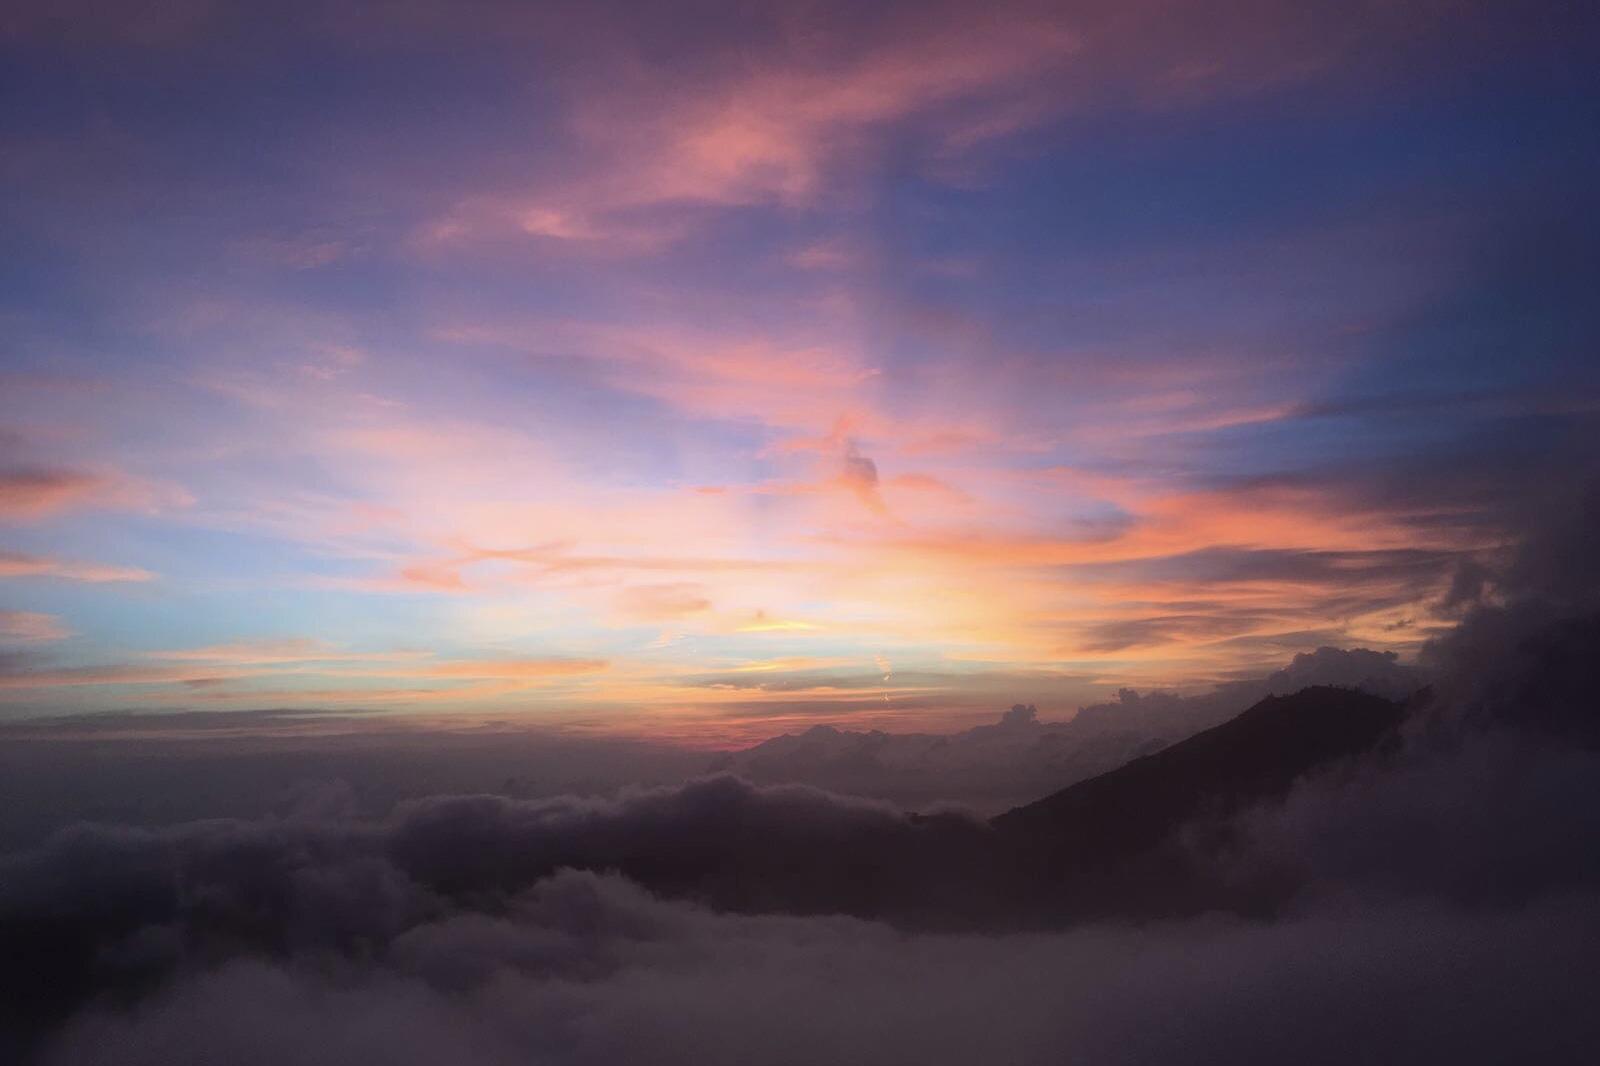 sunrise hike mount batur, zonsopgang batur vulkaan bali